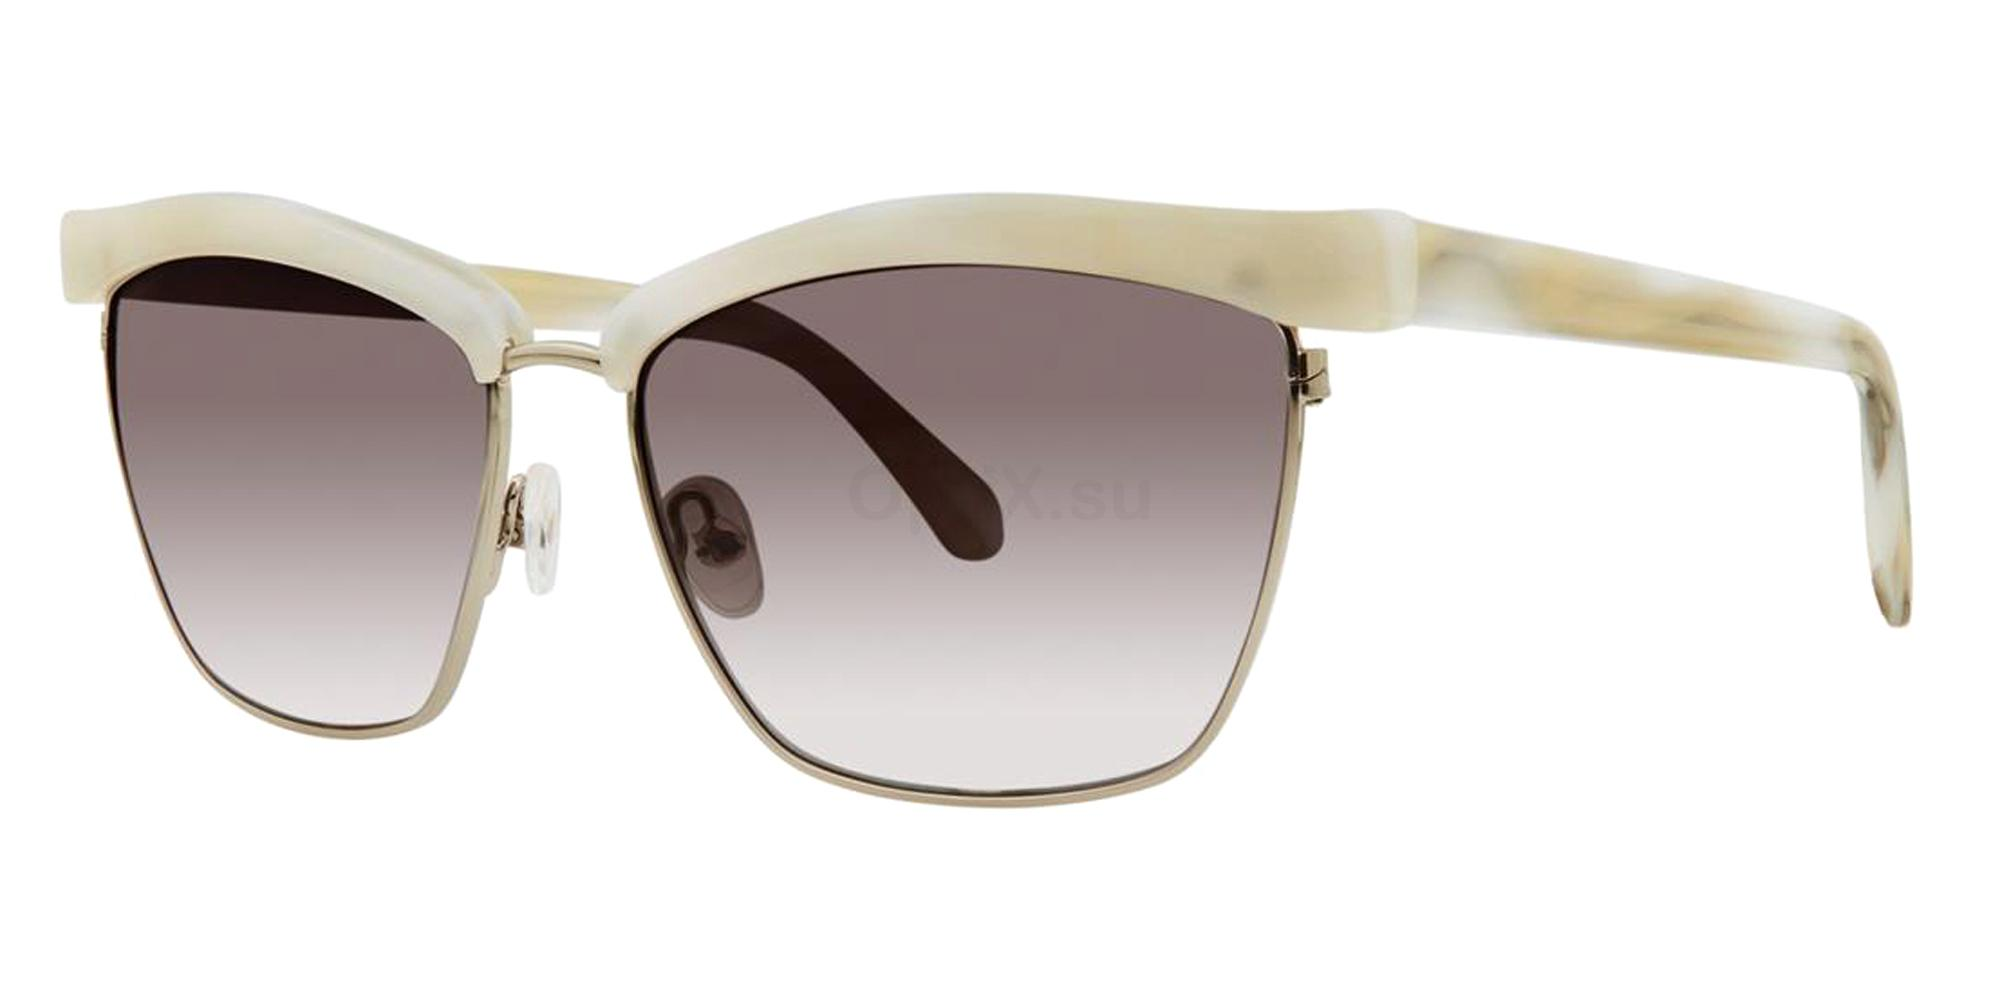 Pearl Horn LAVETTE Sunglasses, Zac Posen